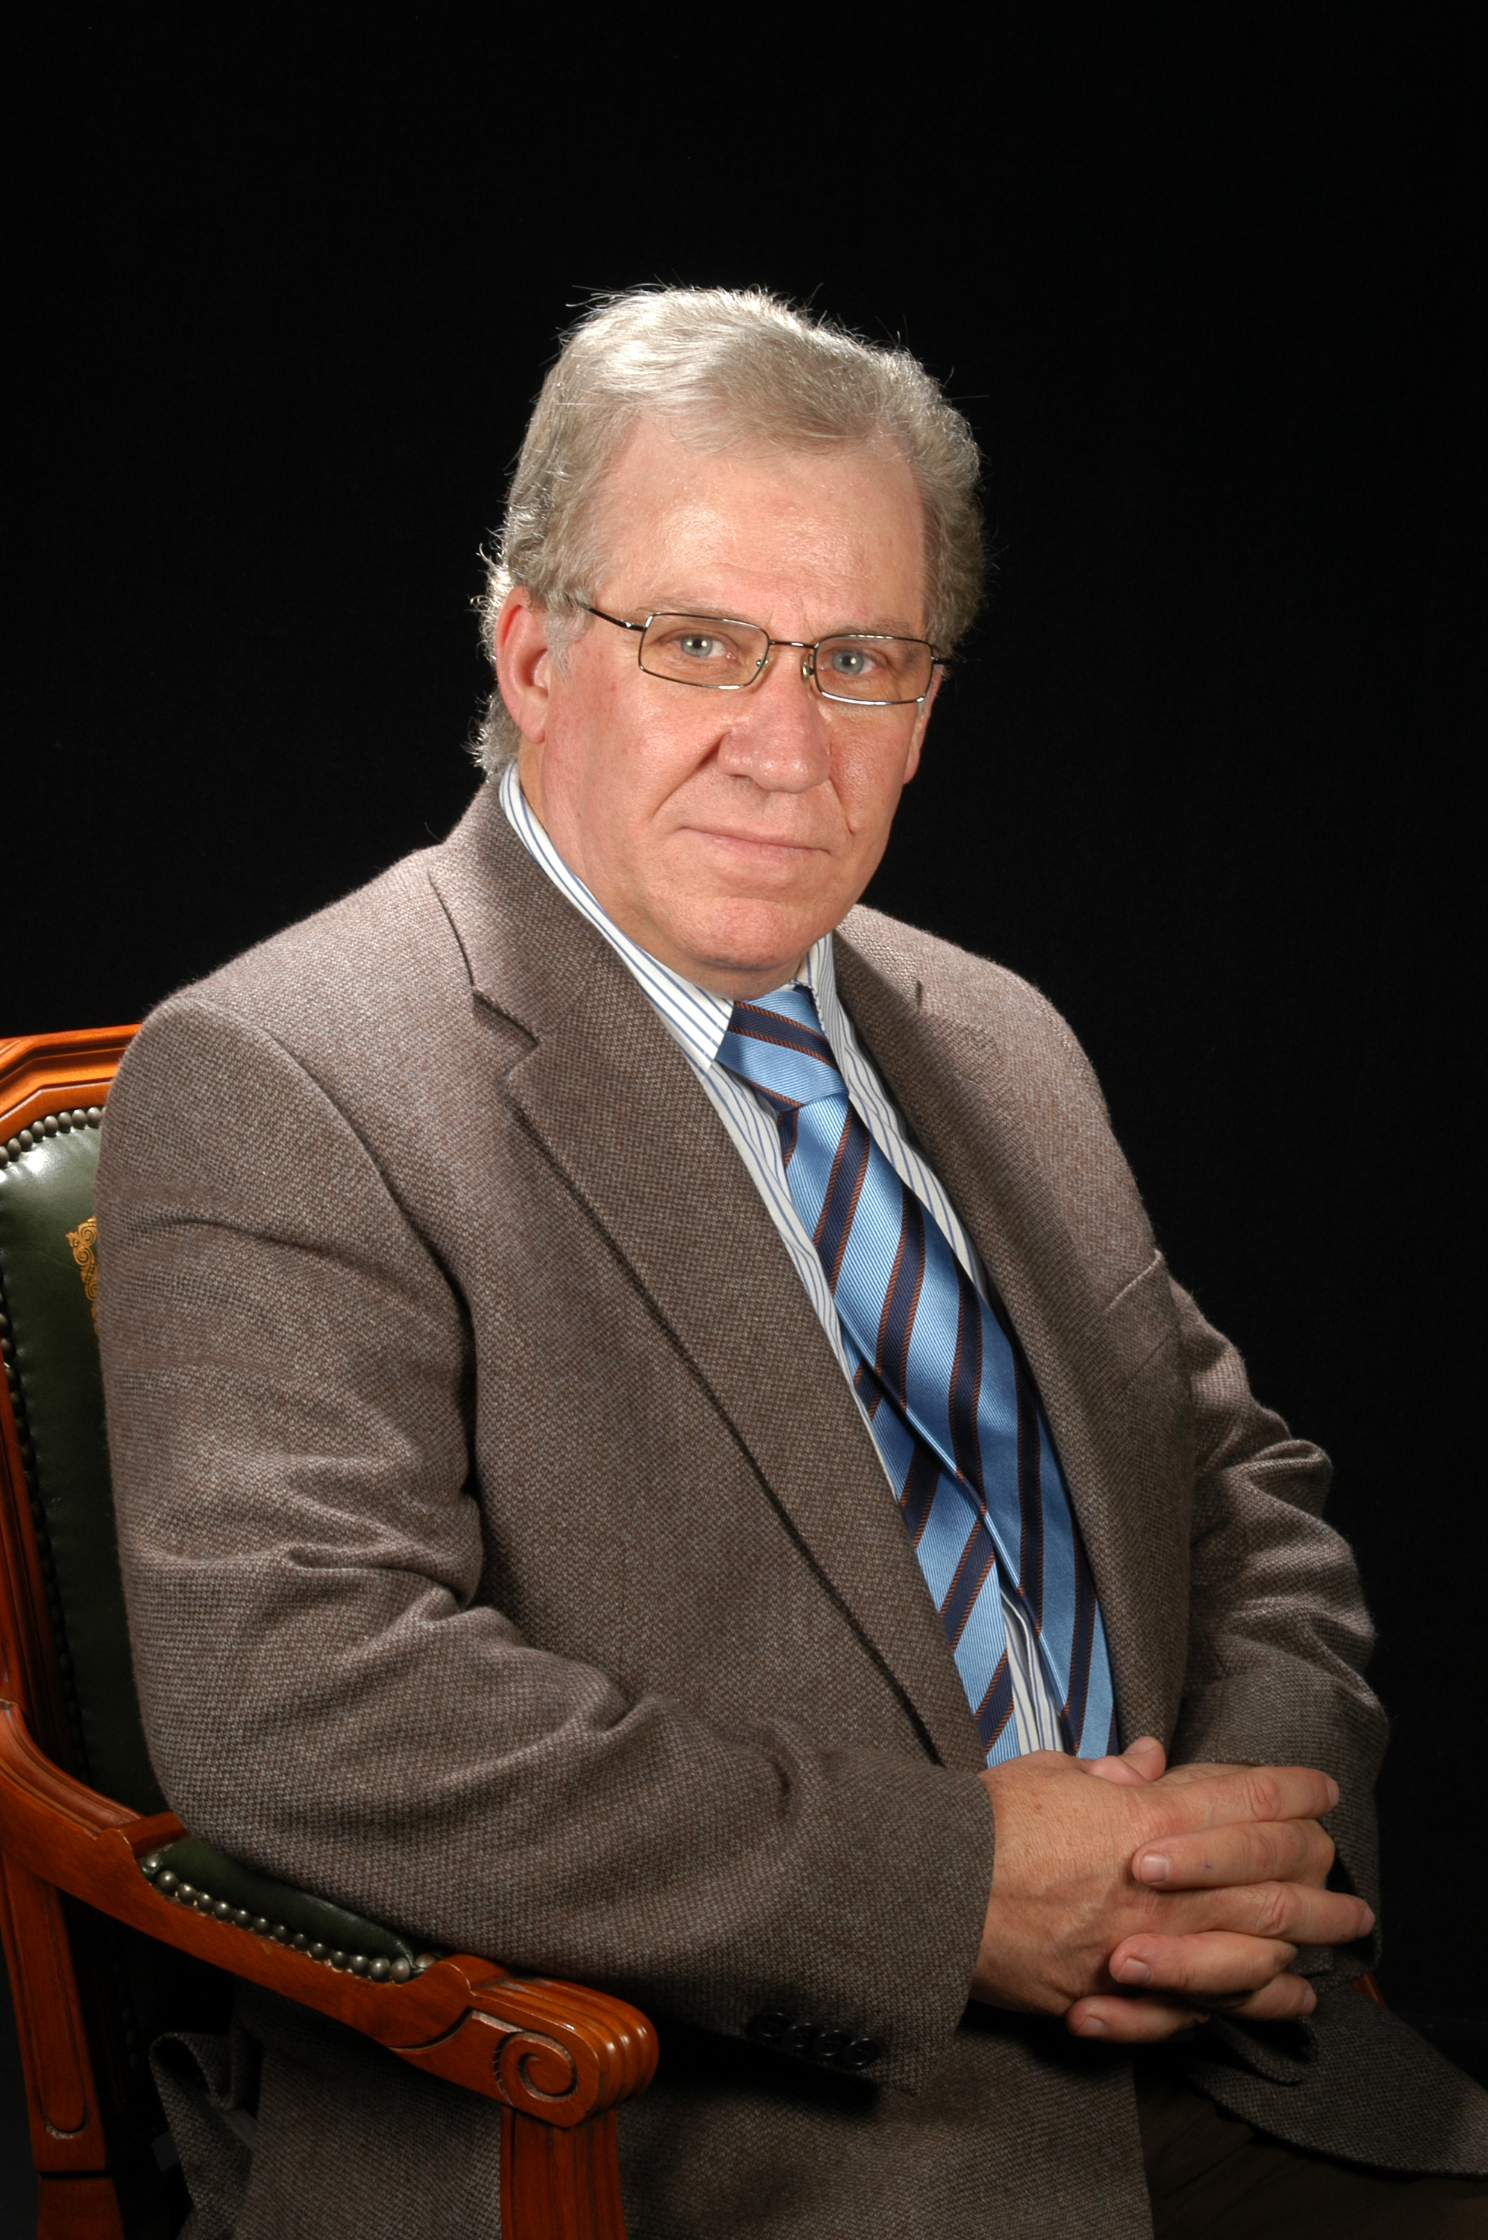 Sr. José Agüera Riquelme